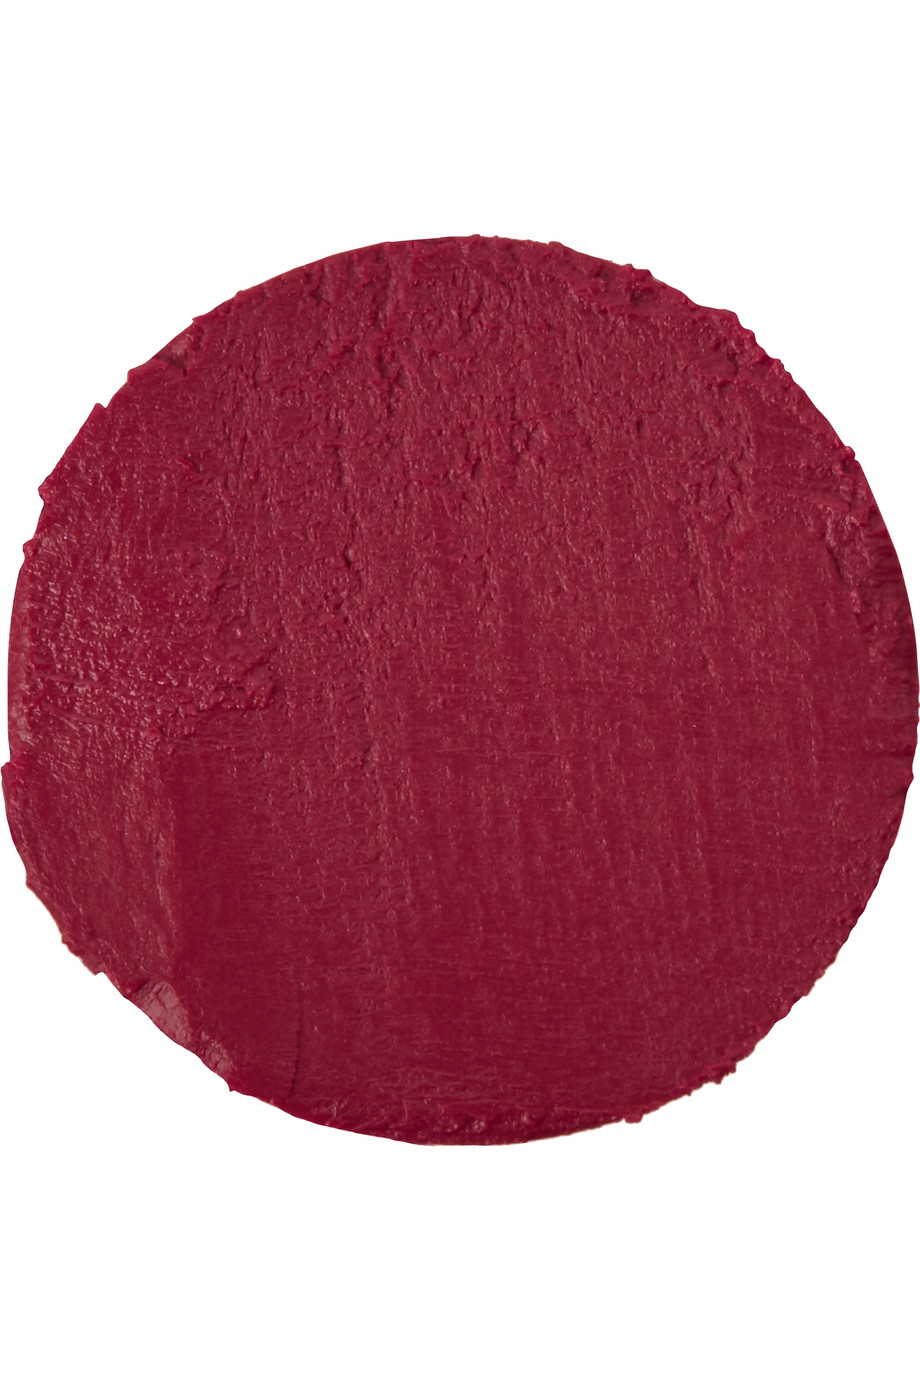 Chantecaille Lip Veil - Iris